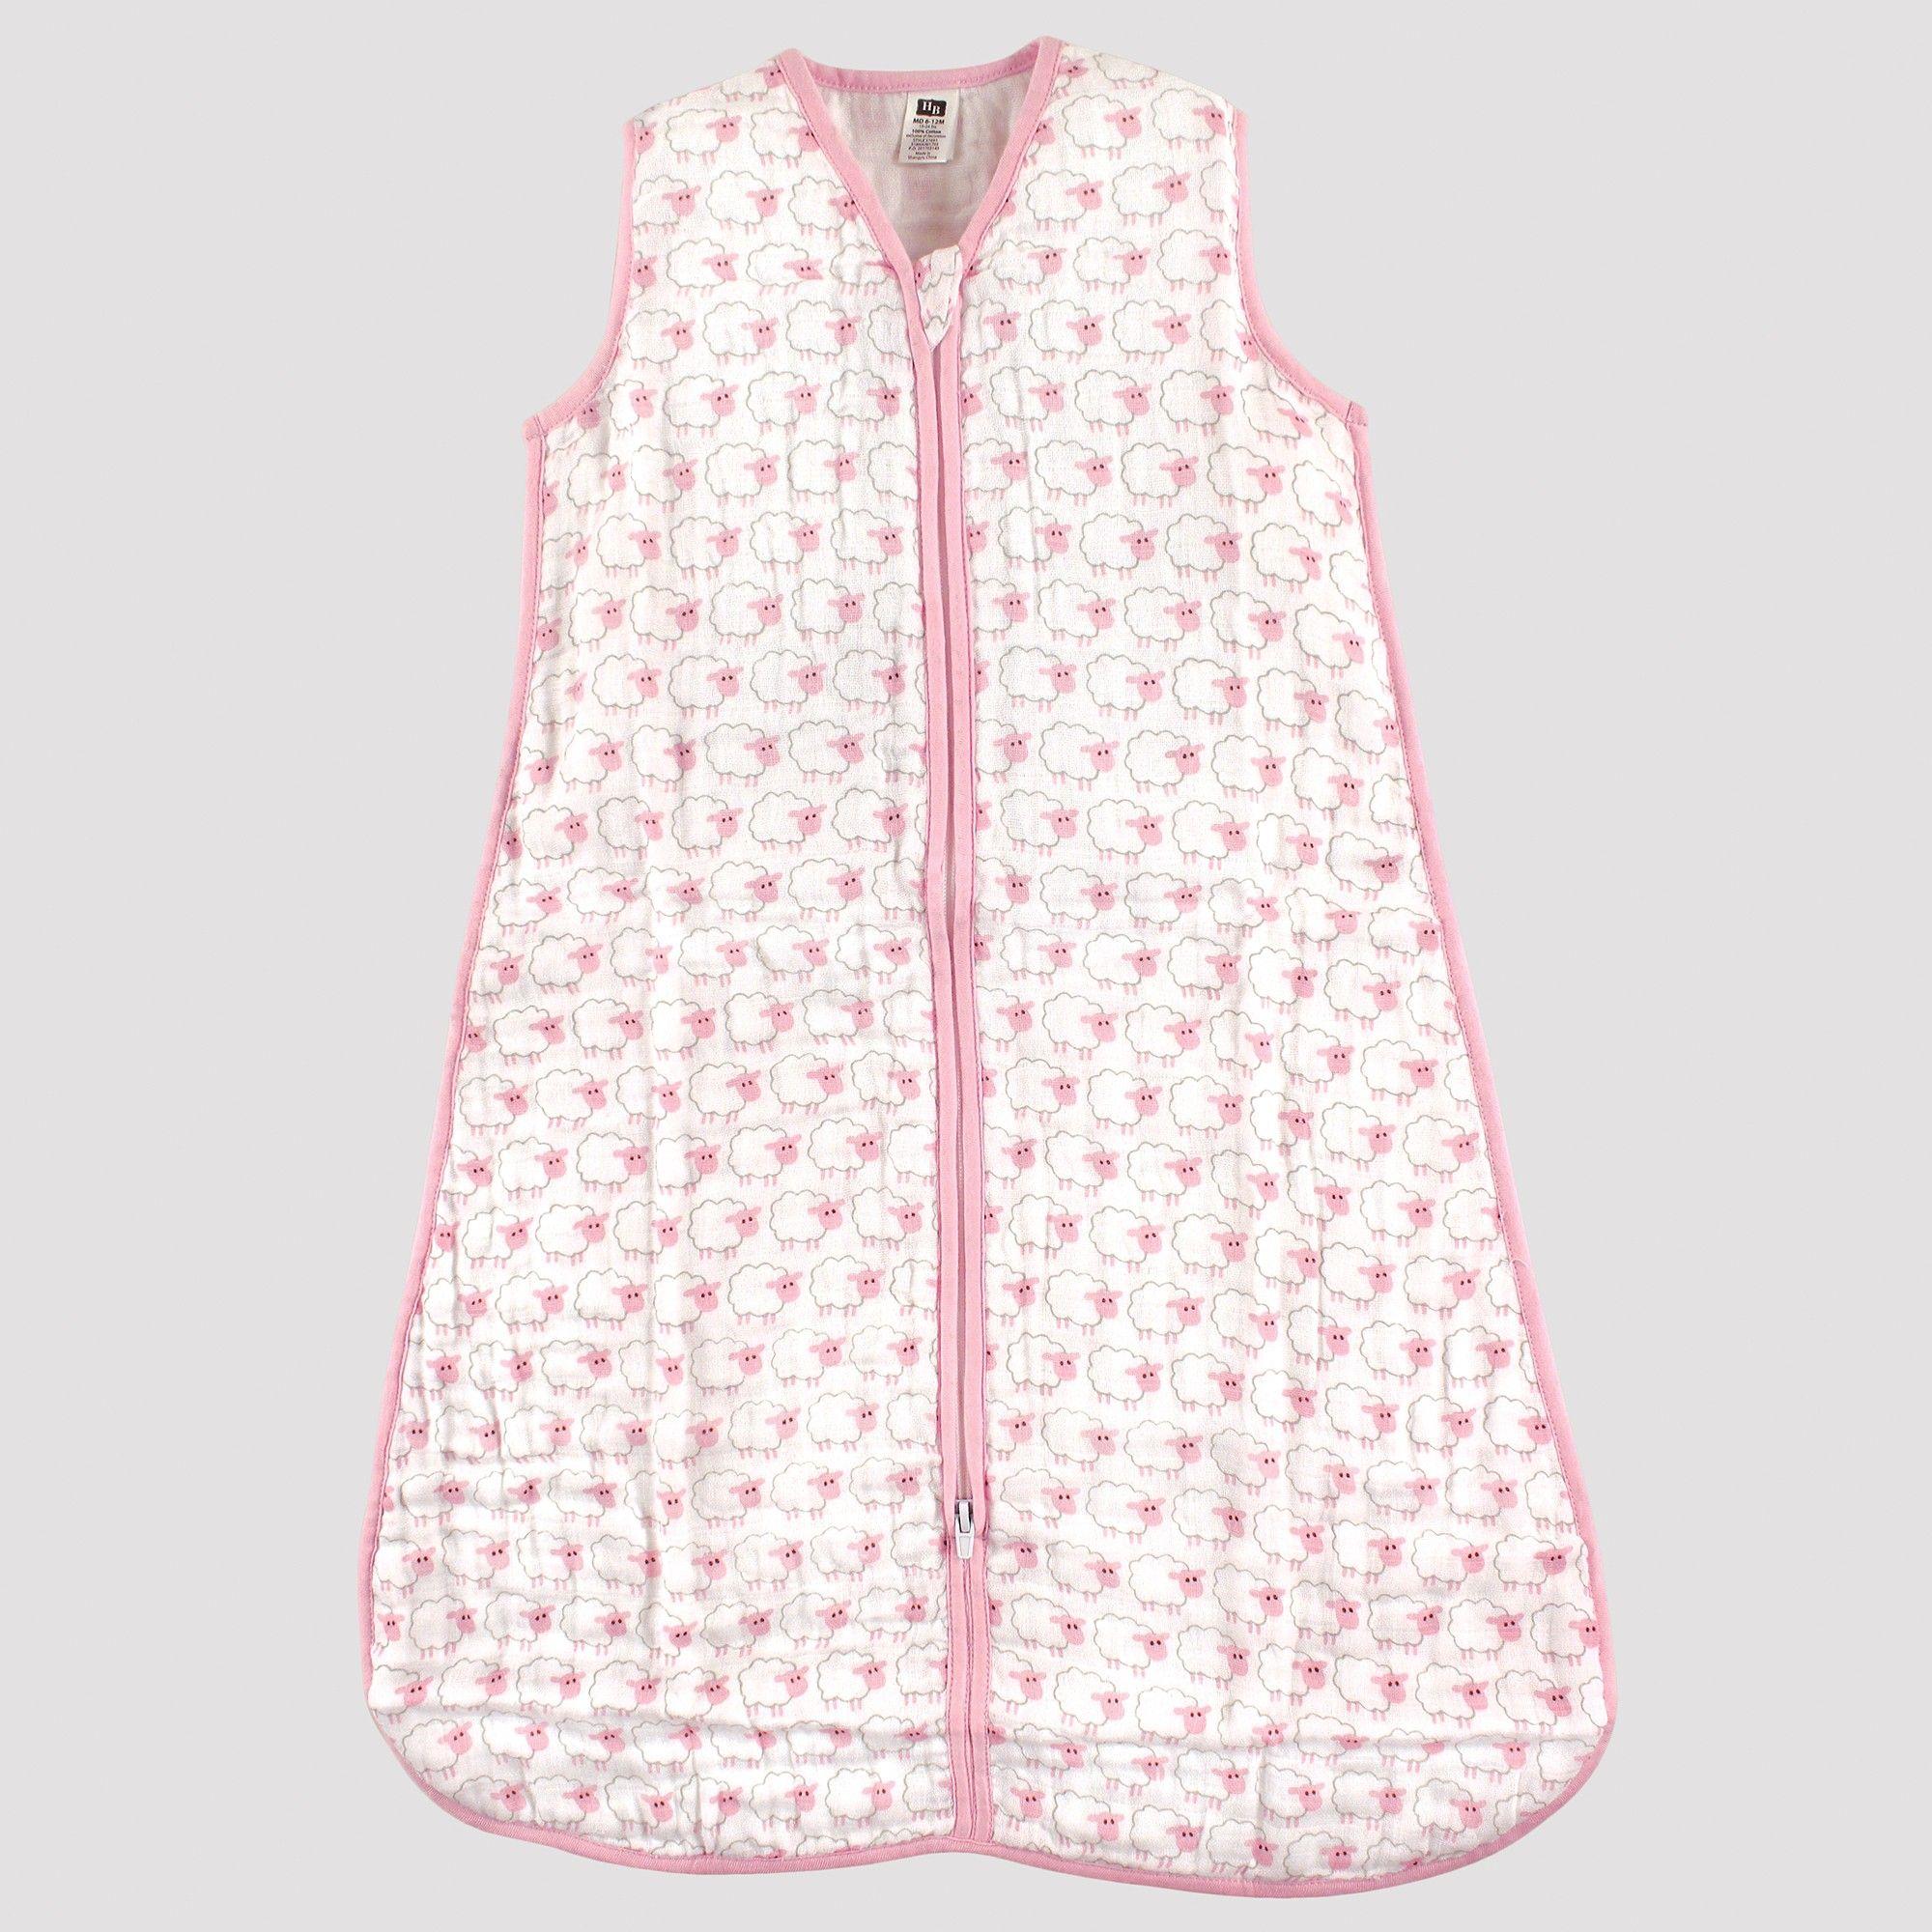 uk availability 24fd7 0f508 Hudson Baby Safe Sleep Wearable Muslin Sleeping Bag - Pink ...